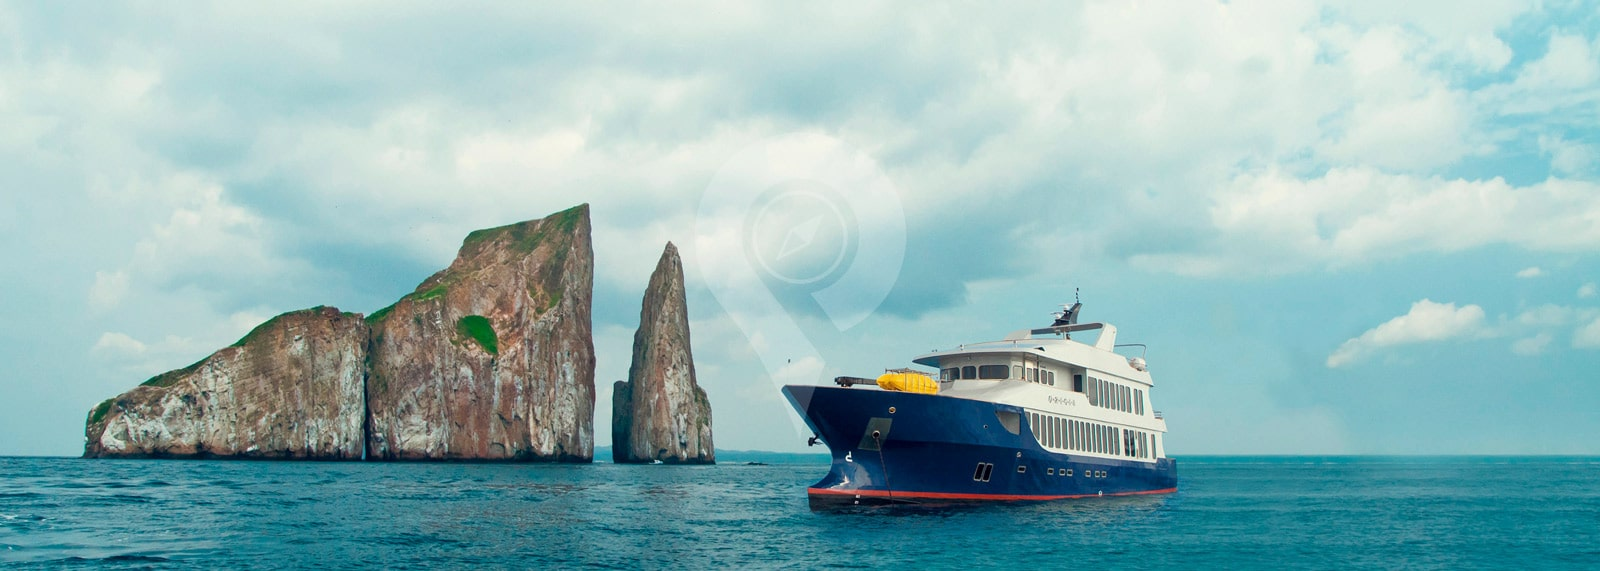 Yates Origin & Theory Galapagos